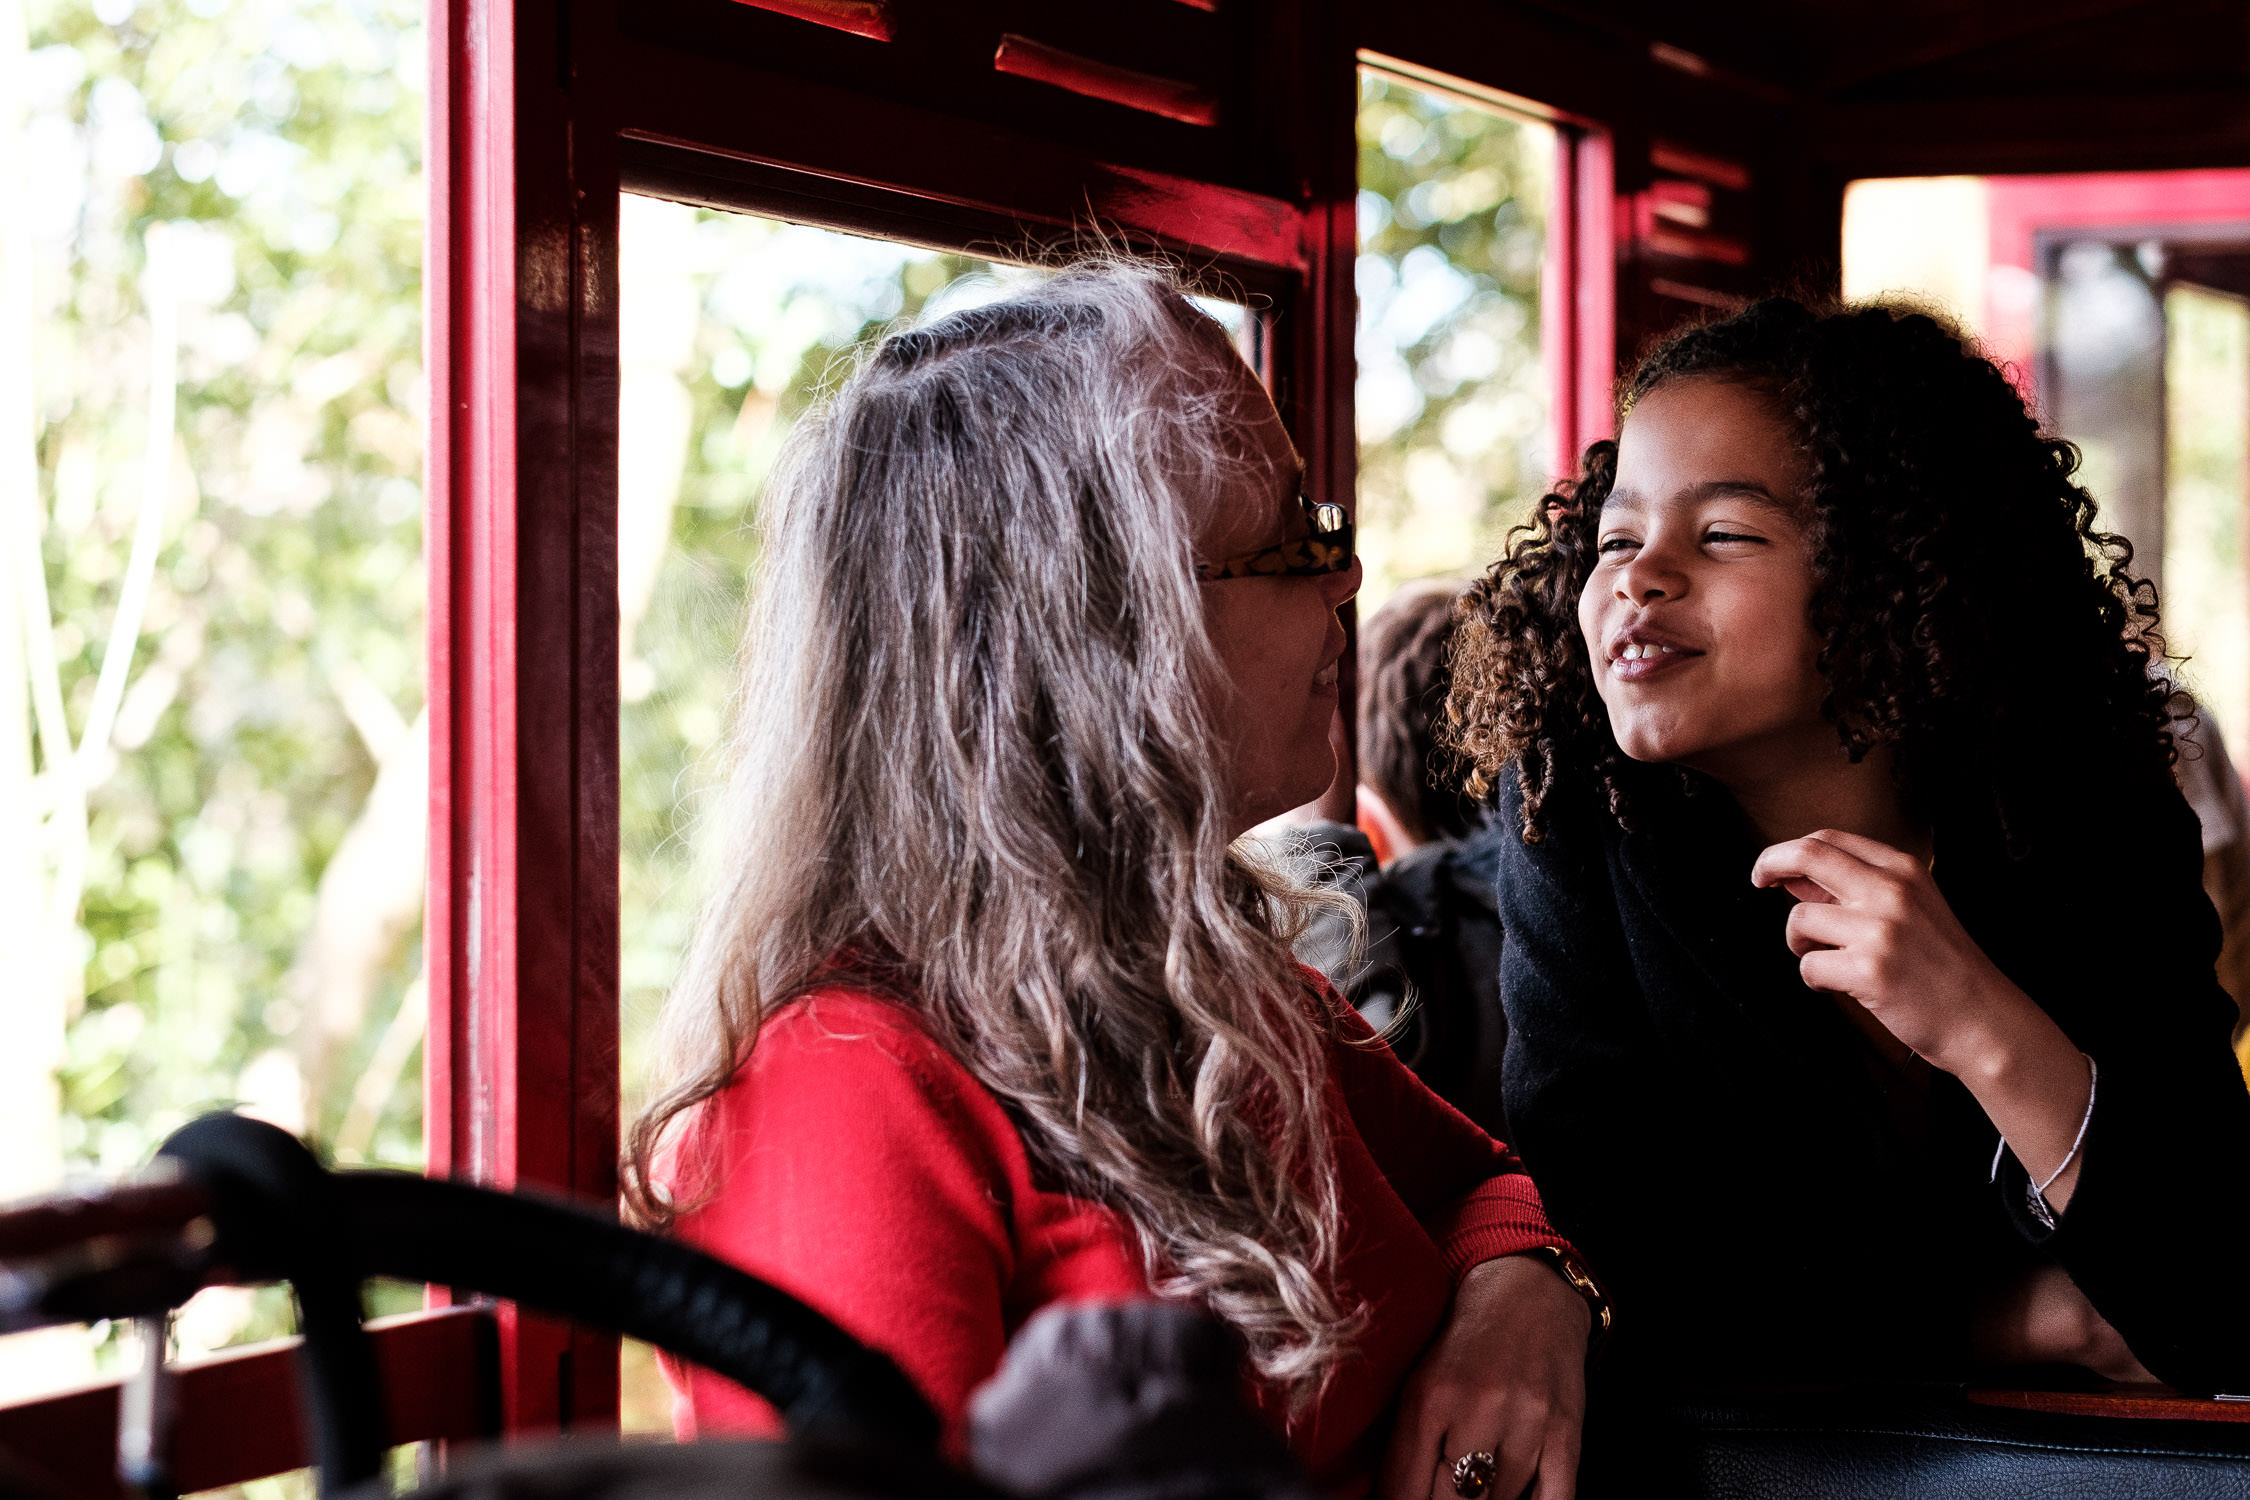 girl smiling on train